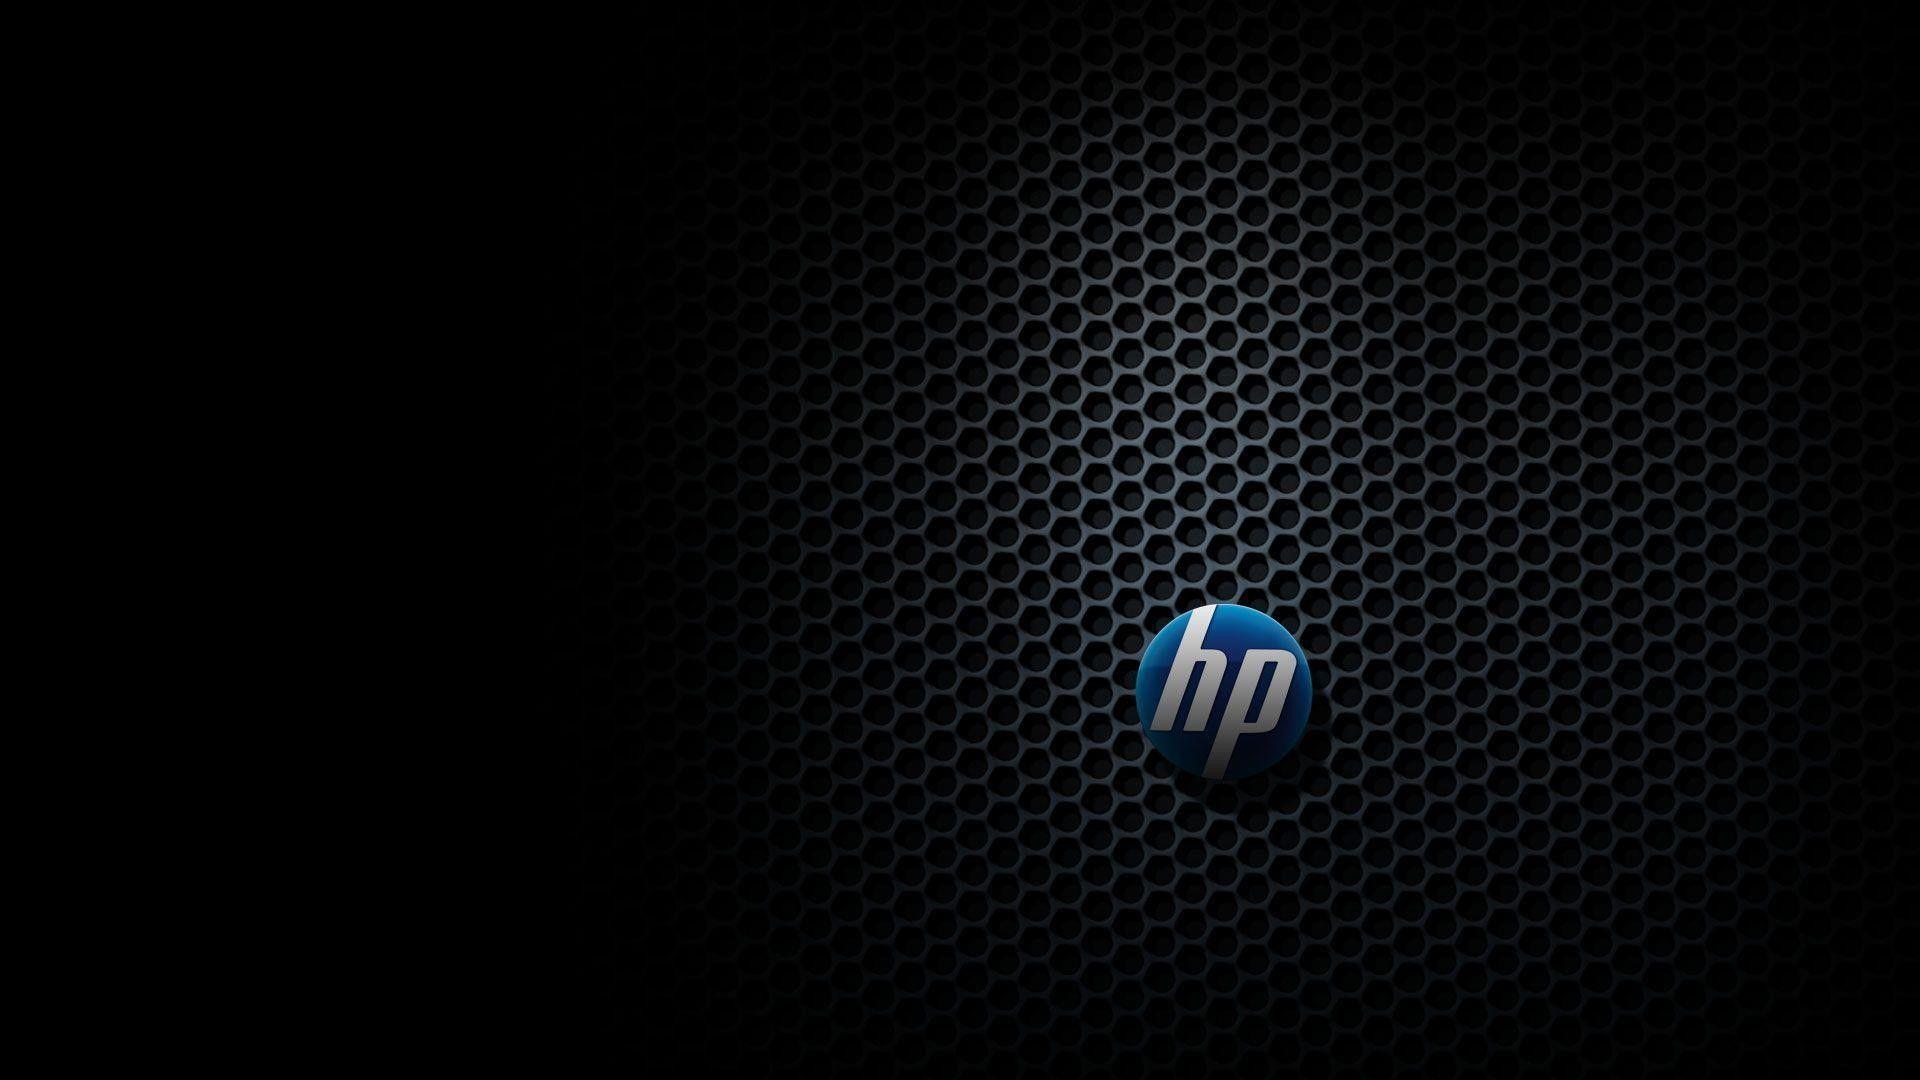 HP Desktop Wallpapers   20k, HD HP Desktop Backgrounds on WallpaperBat